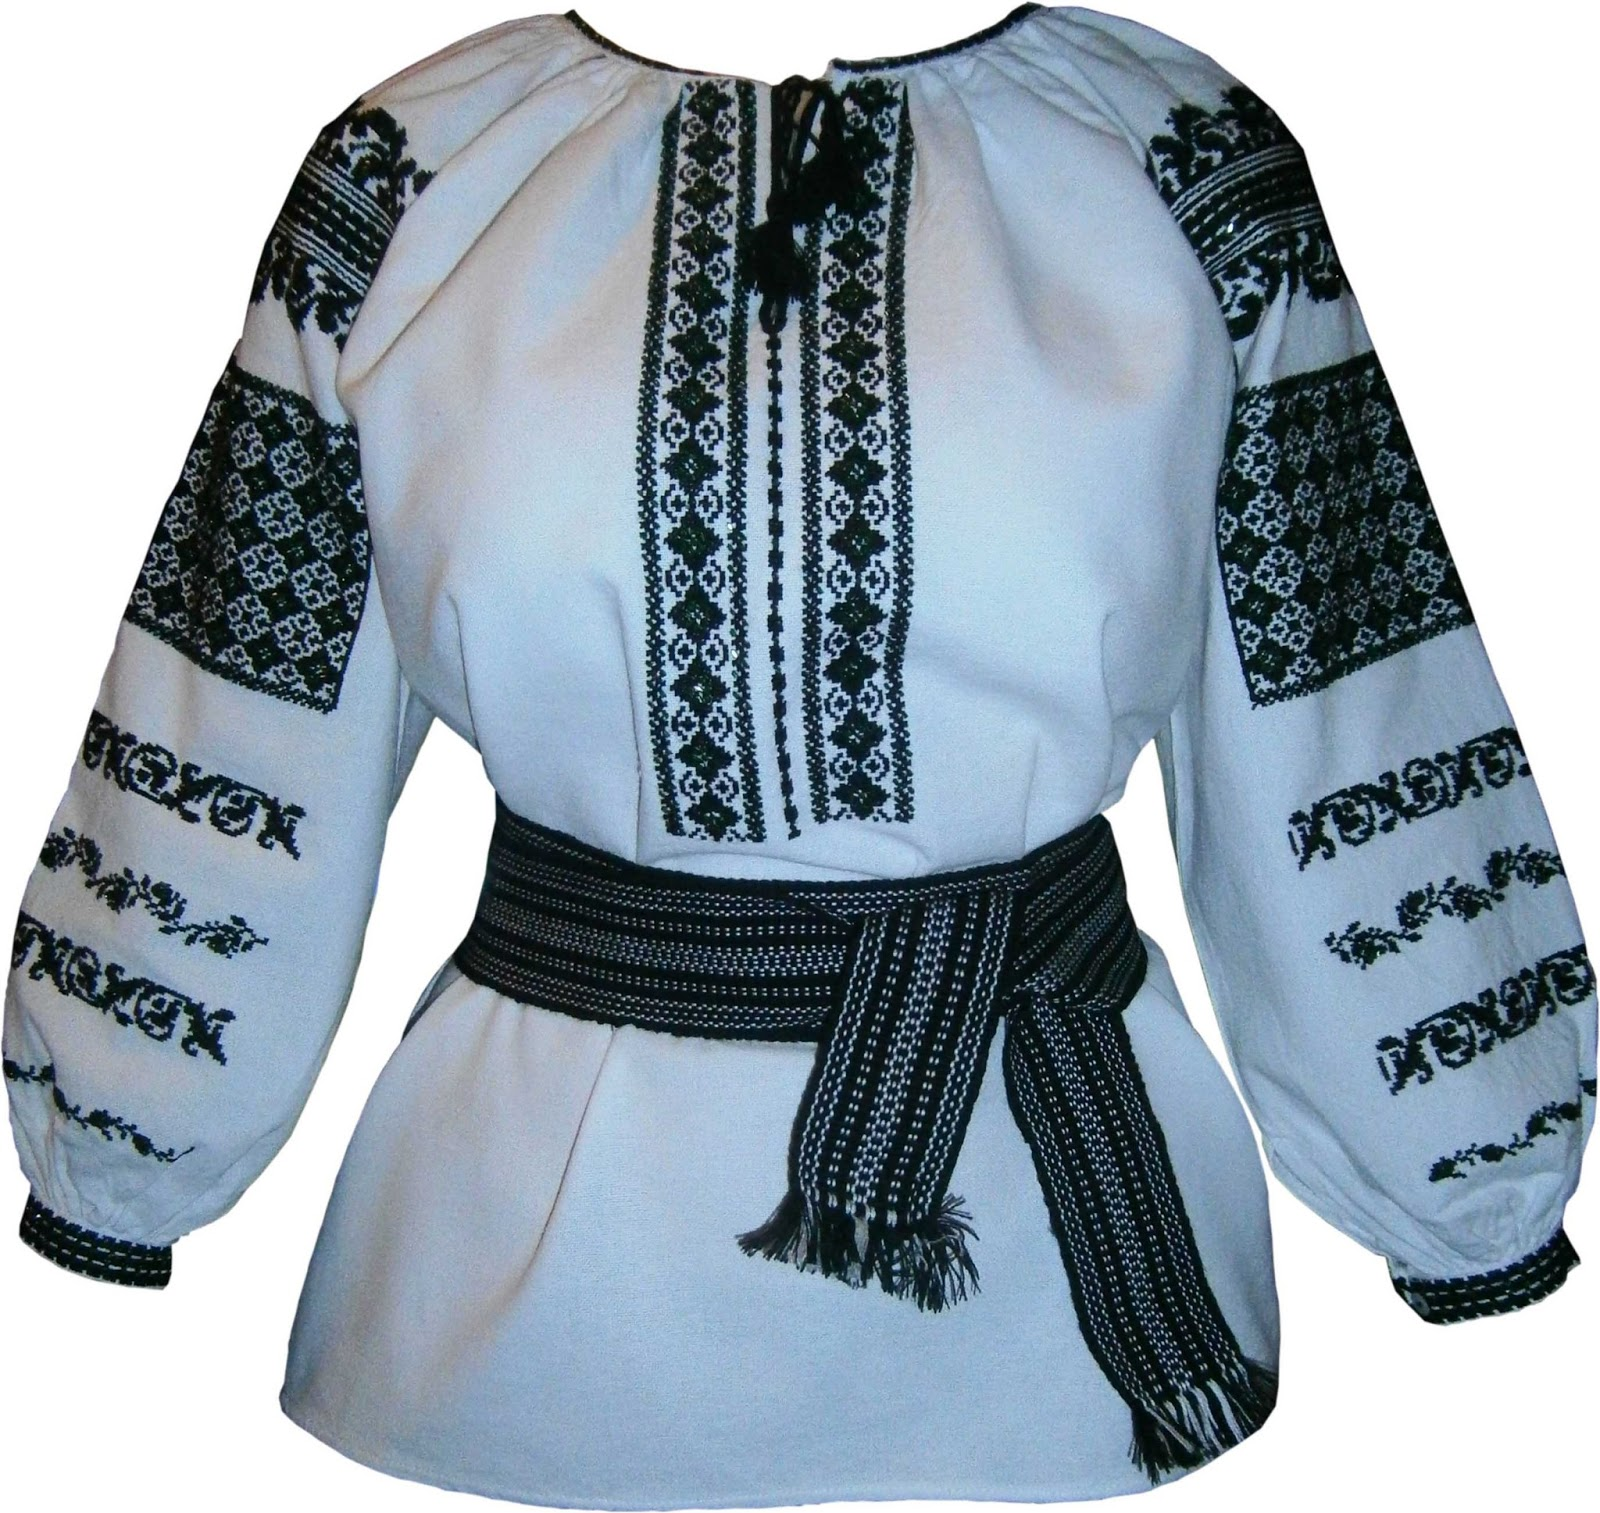 Вишиванка - Інтернет-магазин вишиванок  Жіноча вишиванка e7c14fa015f47